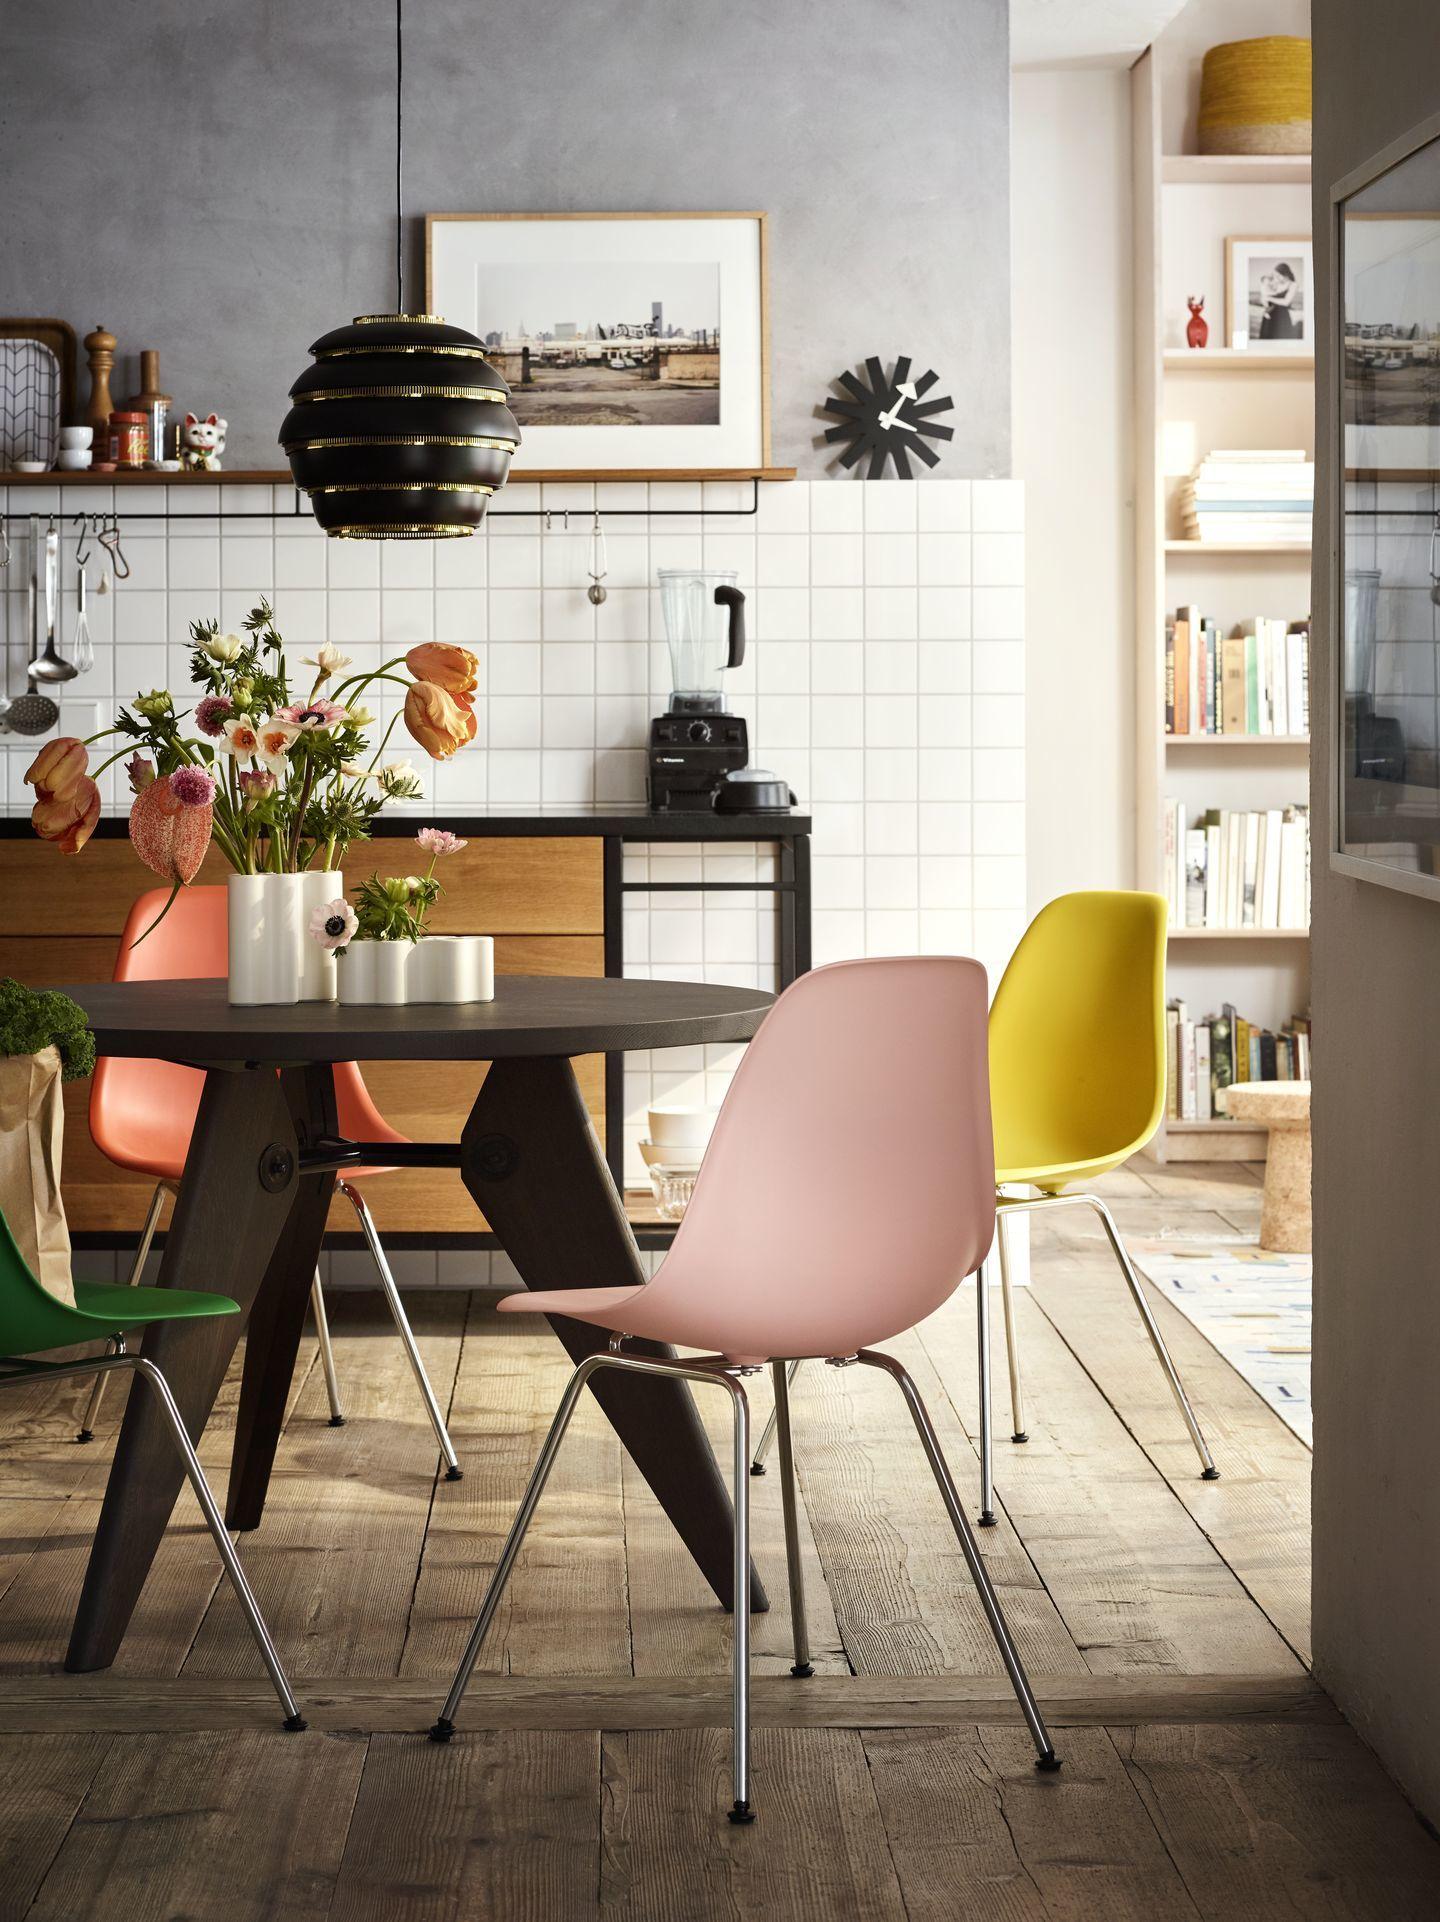 Eames Plastic Side Chair DSX Stuhl Vitra Farben 2019 Schwarz - Granitgrau